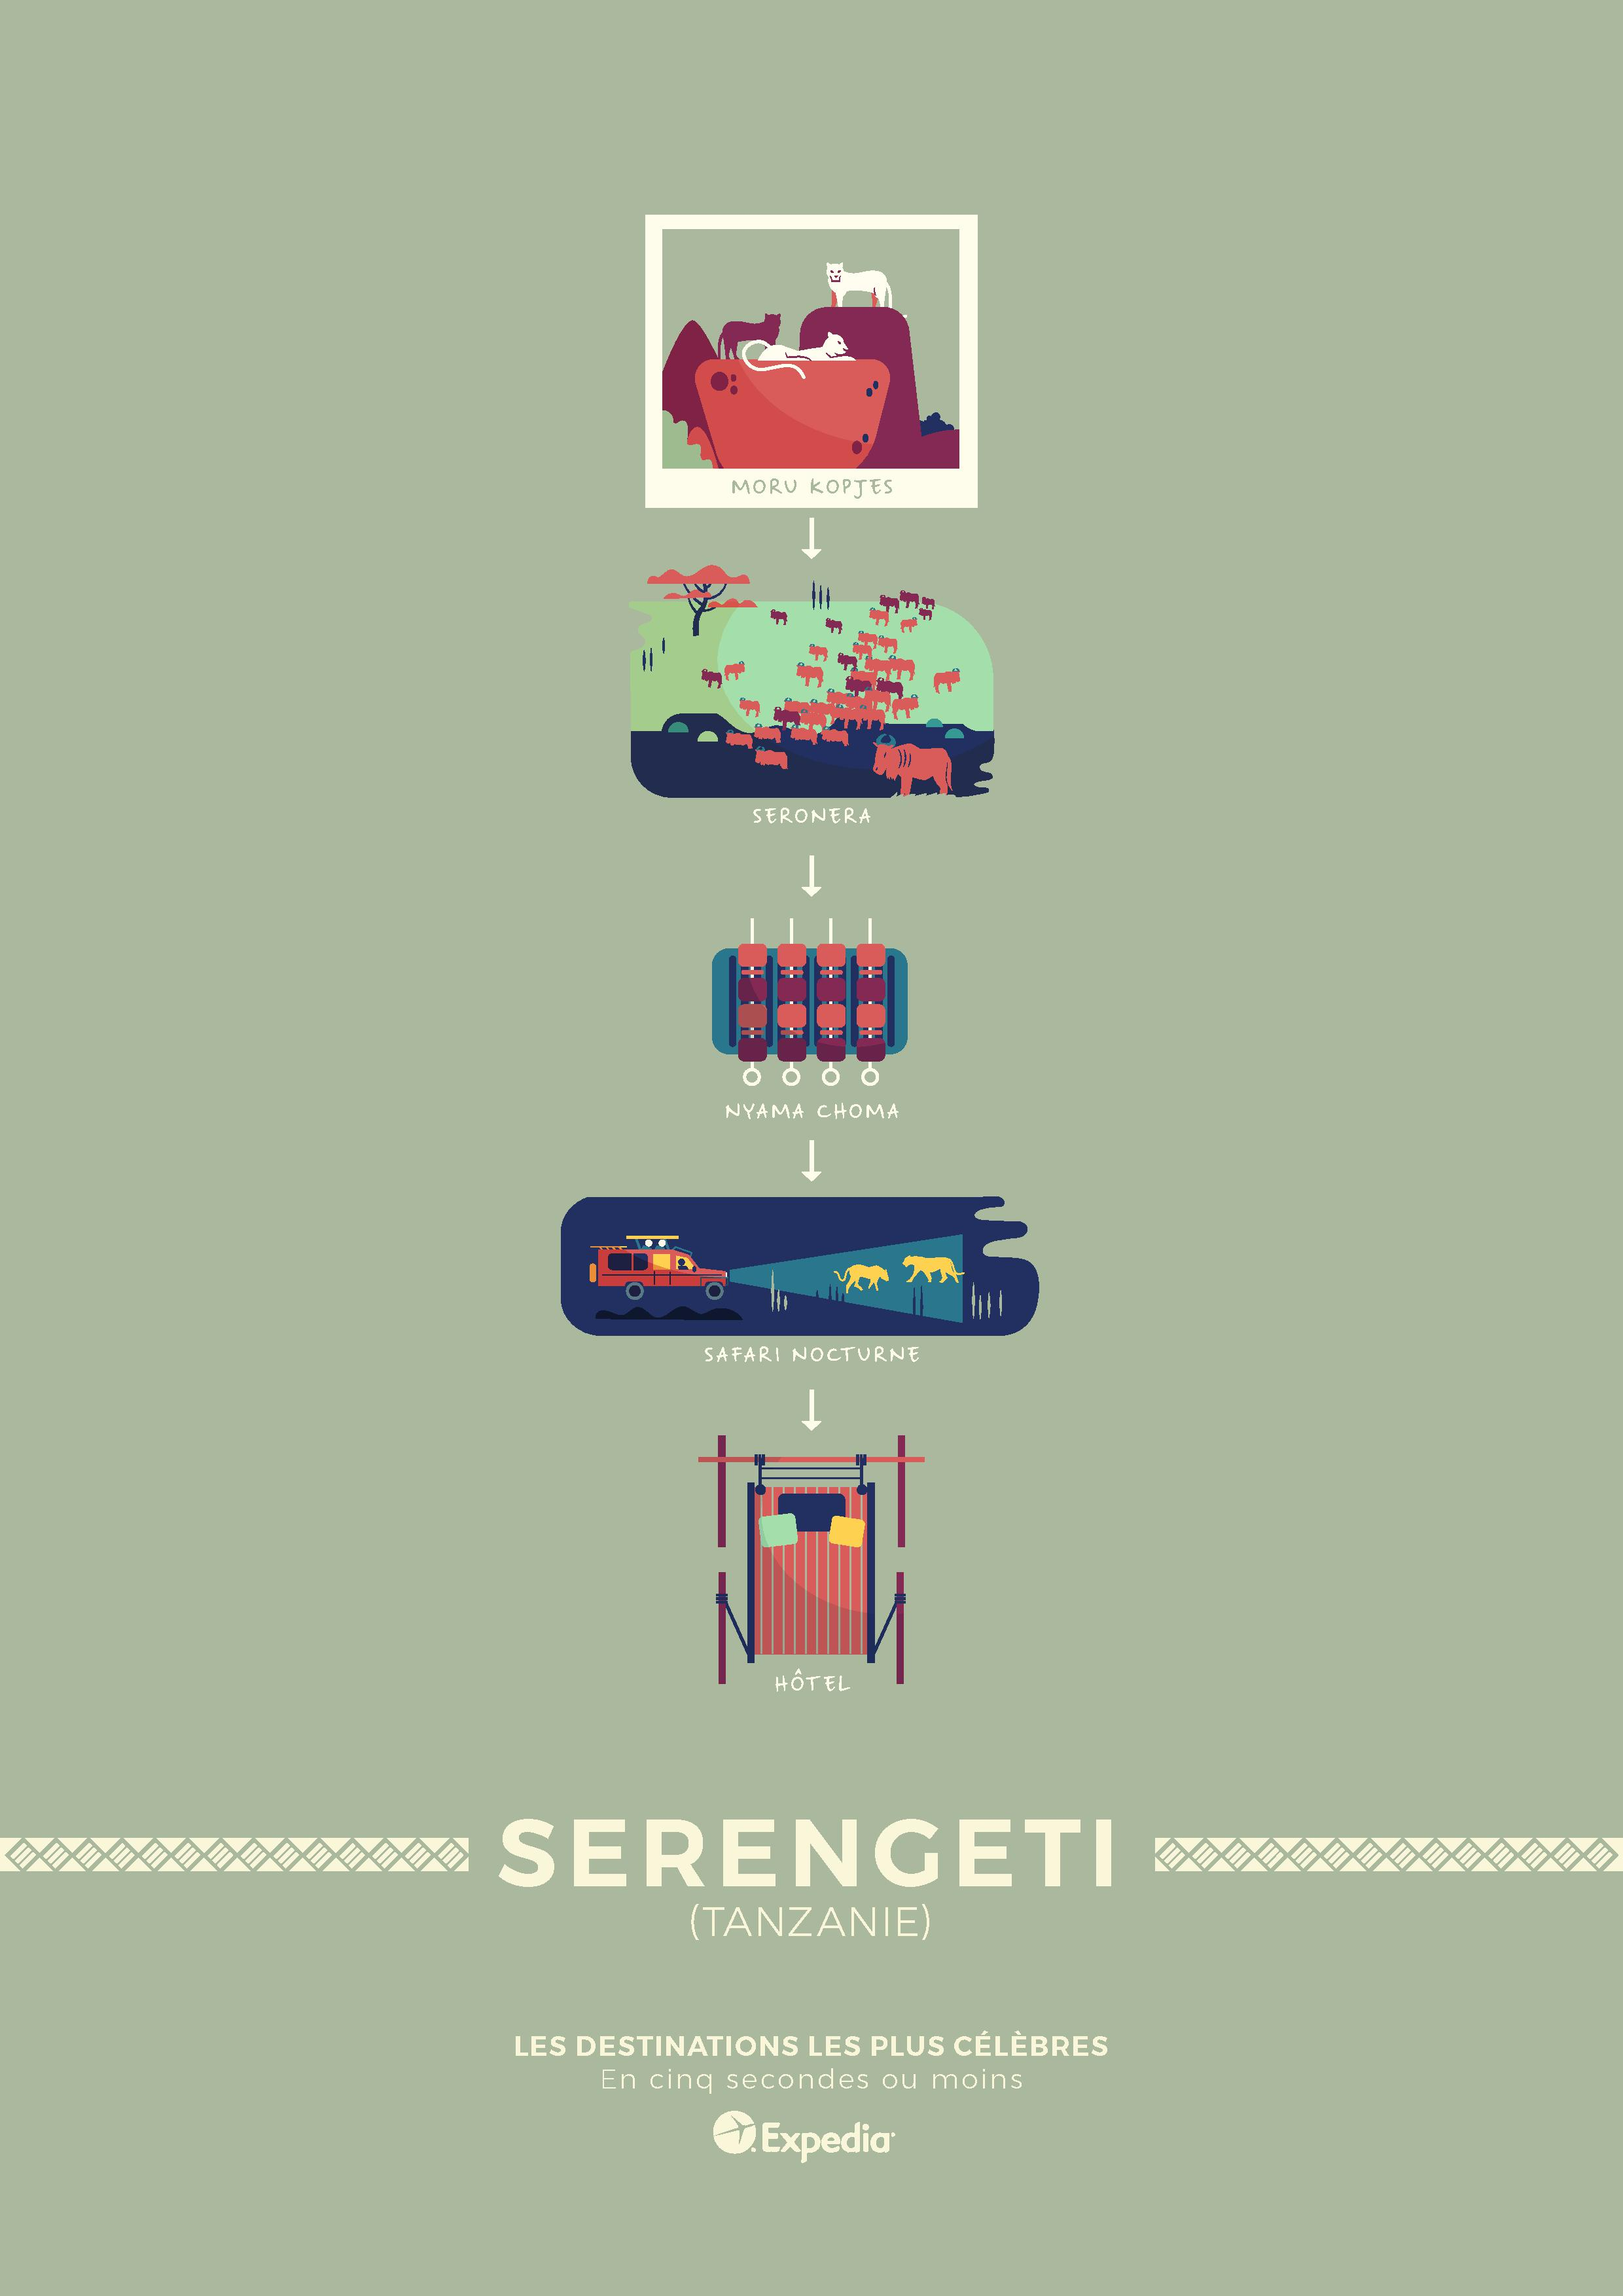 Poster-voyage-Serengeti.jpg?1542813749